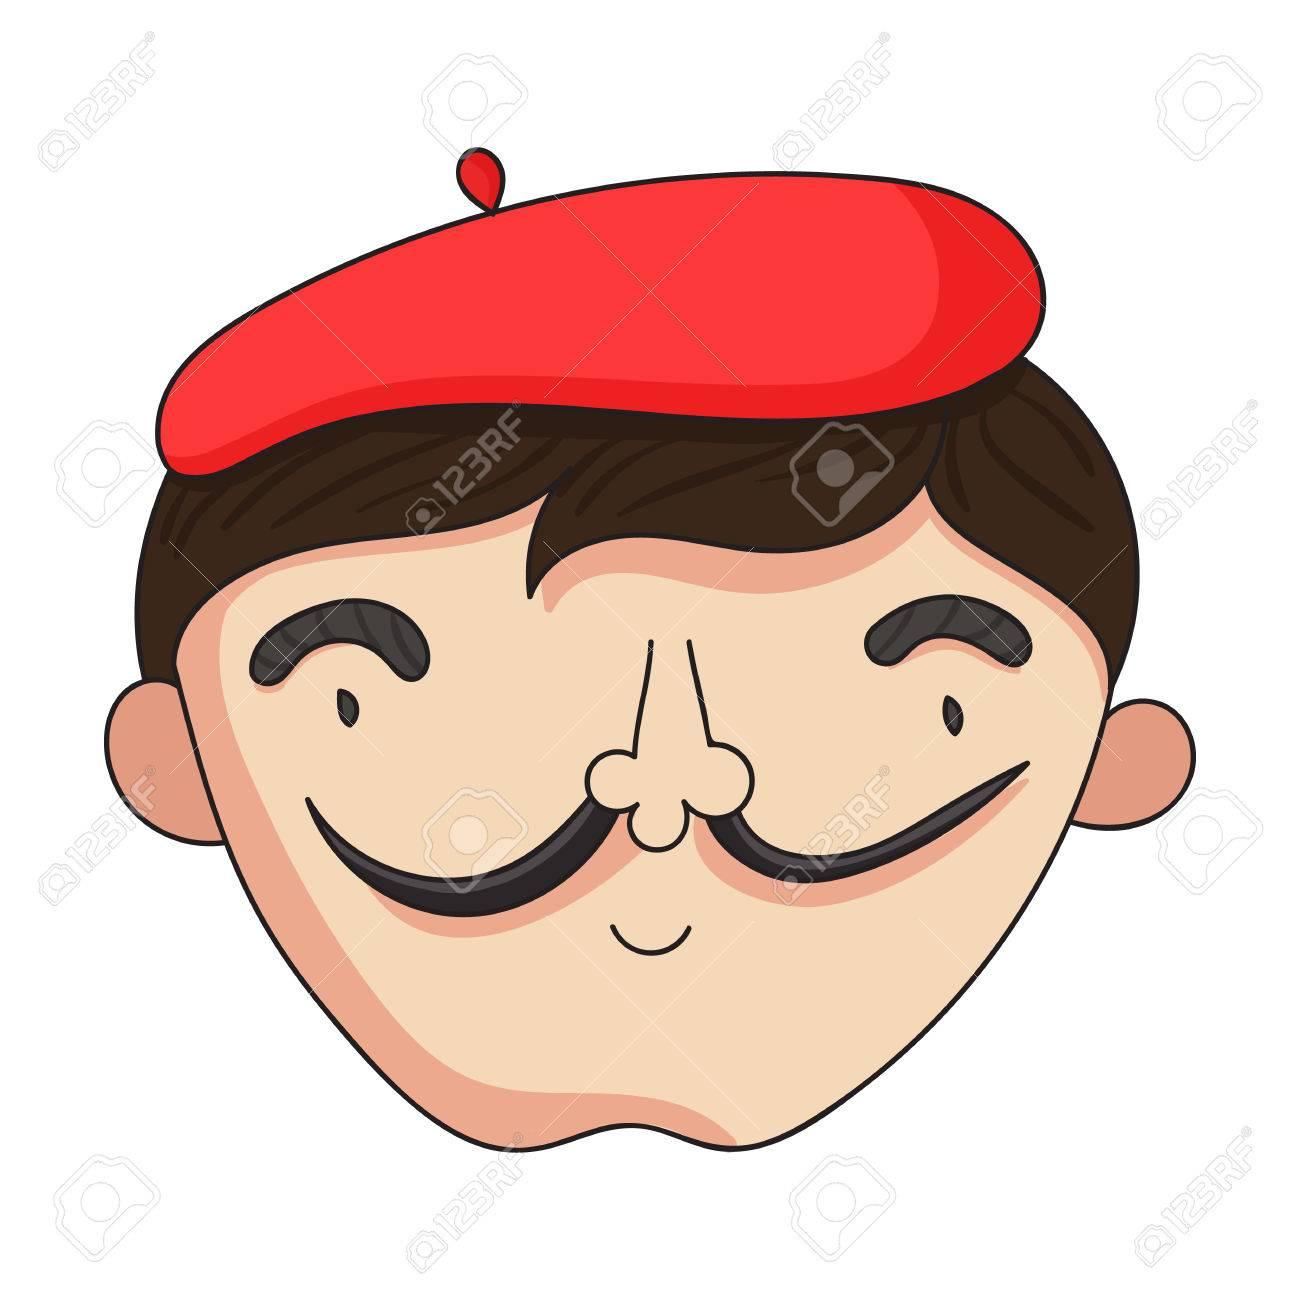 Selfie Smile Face Sign Icon Self Stock Vector 241886053 - Shutterstock